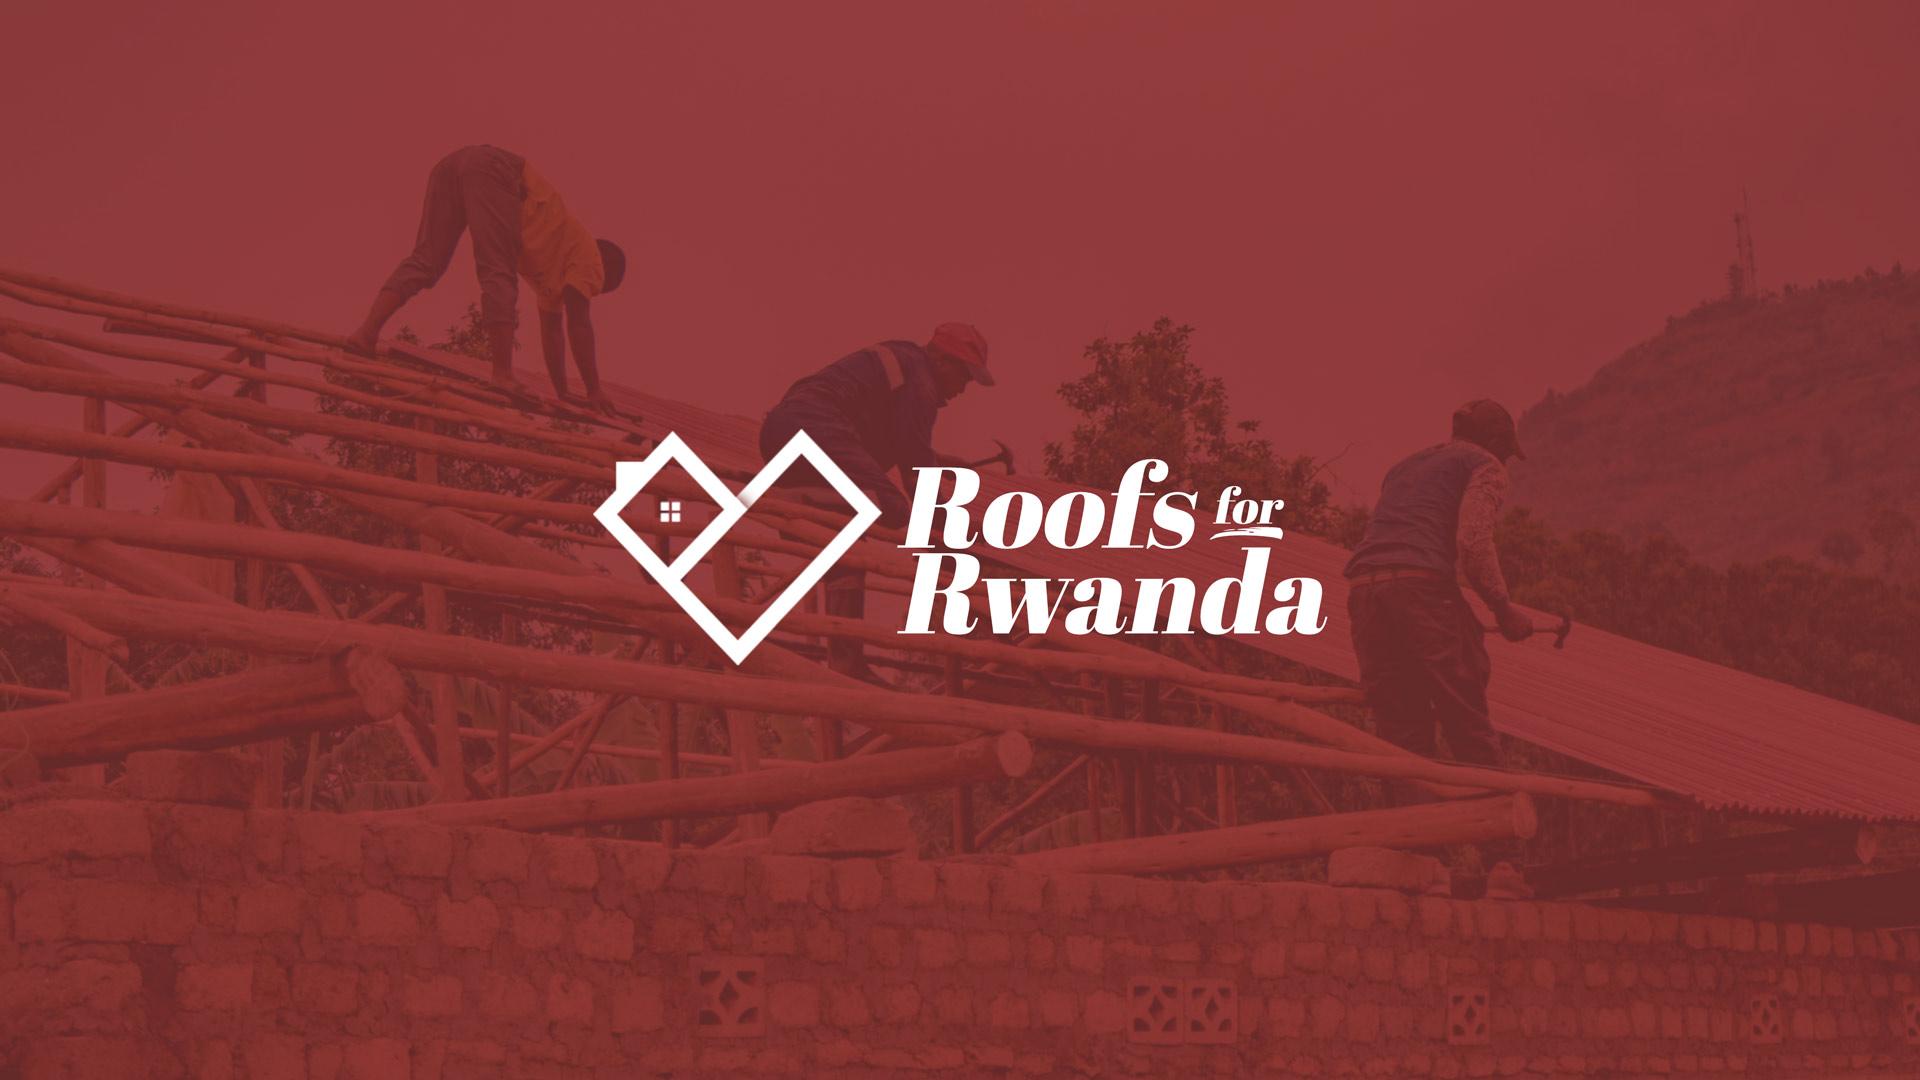 Roofs for Rwanda